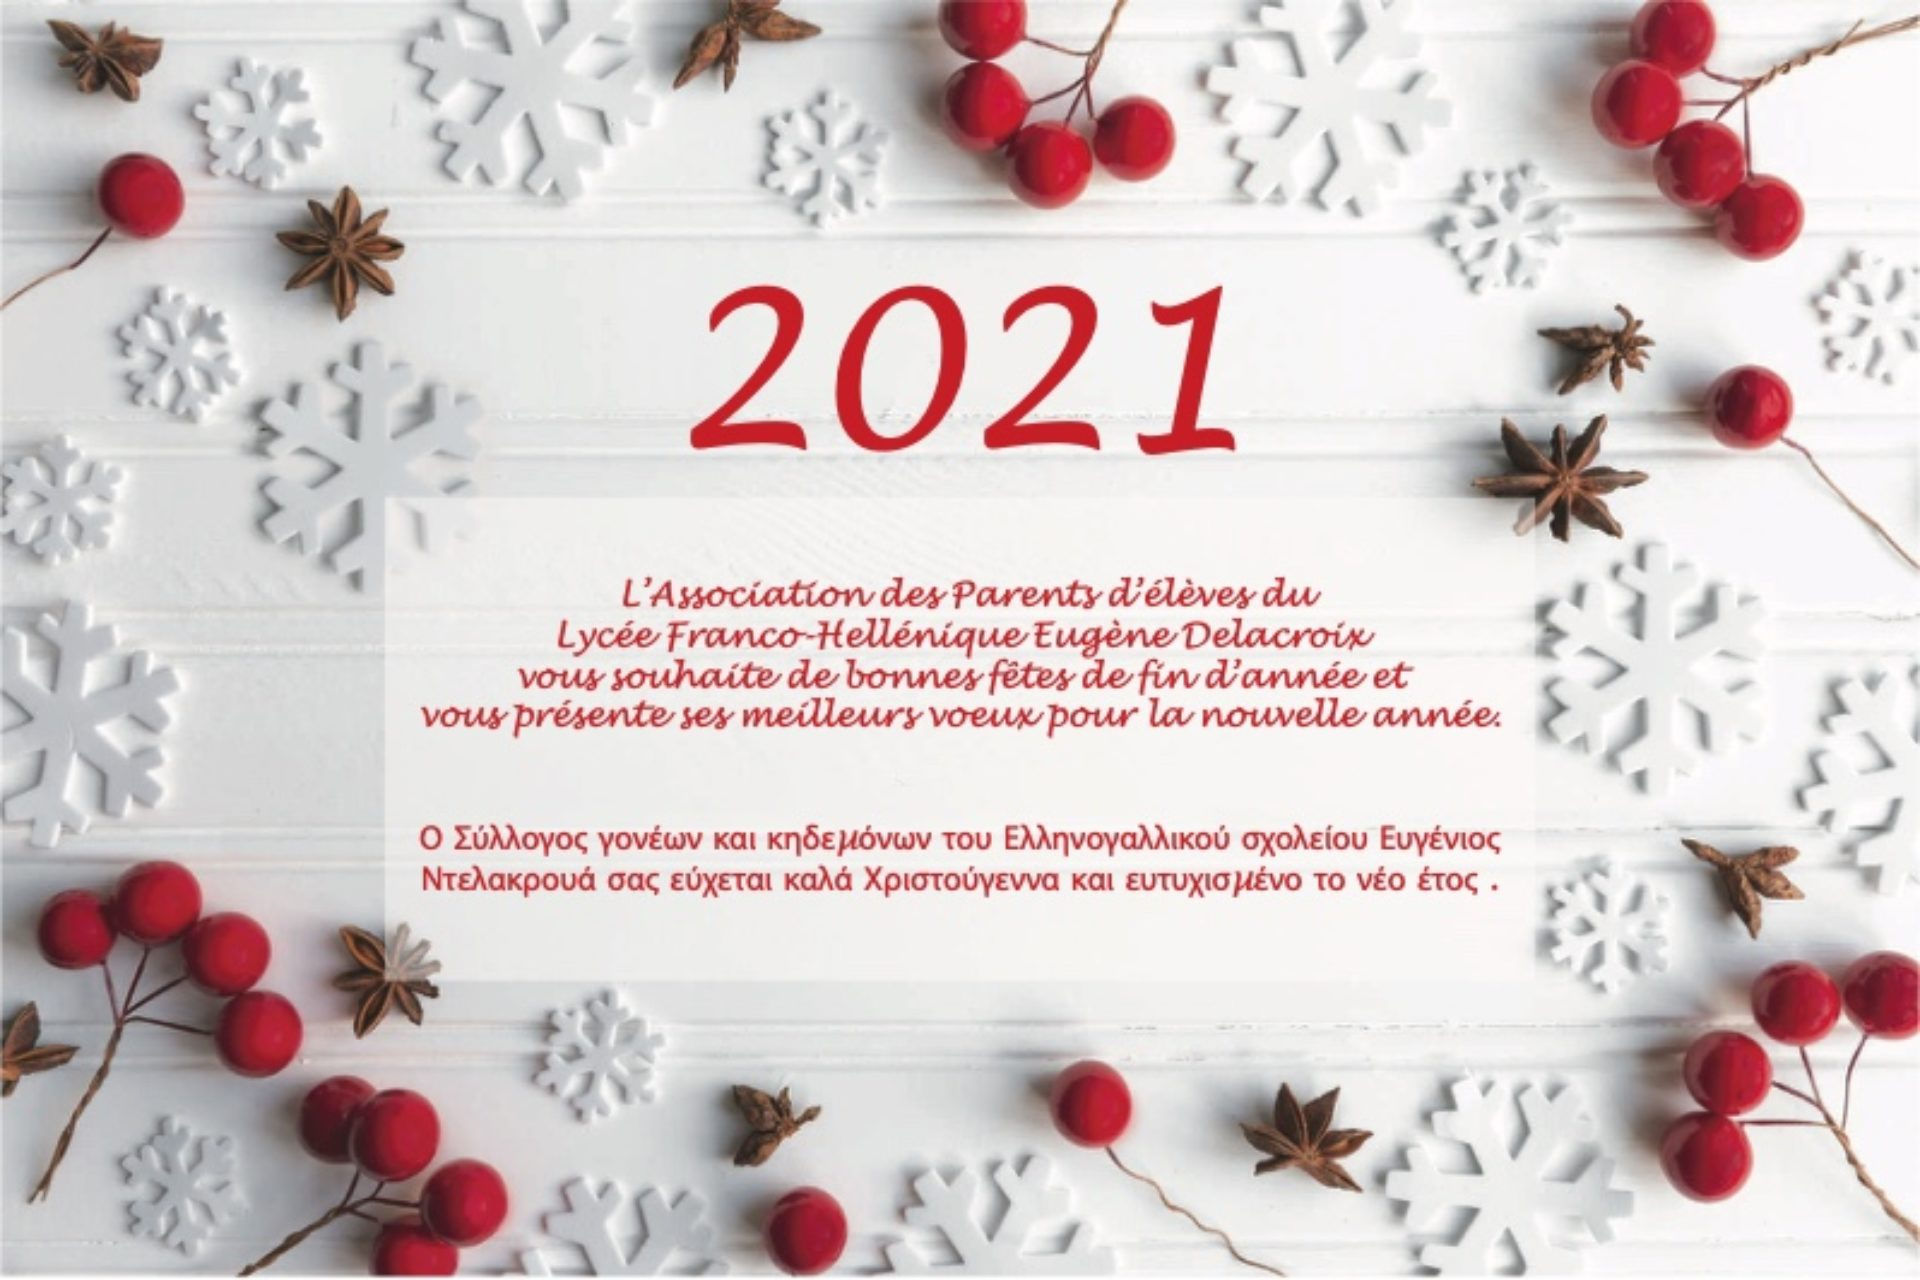 Joyeux Noël 2020, Bonne année 2021 !